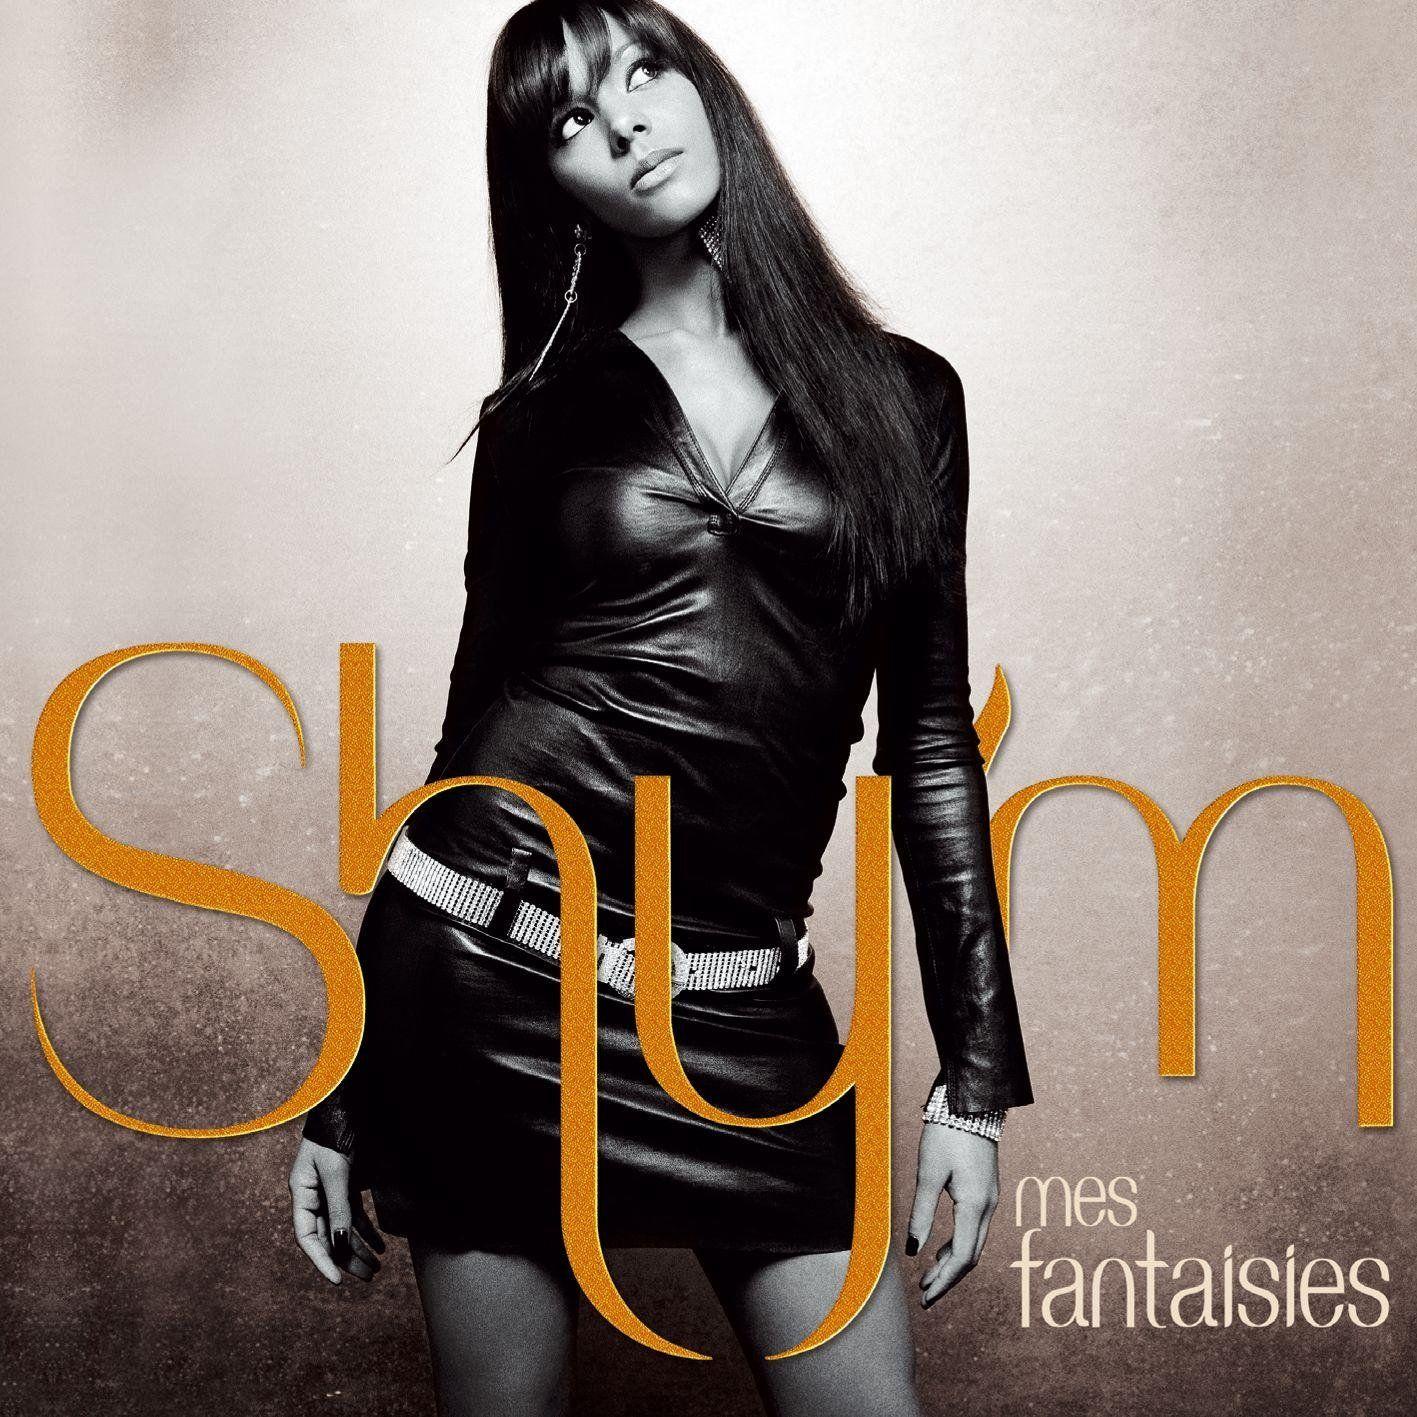 Shy'm - Mes Fantaisies album cover